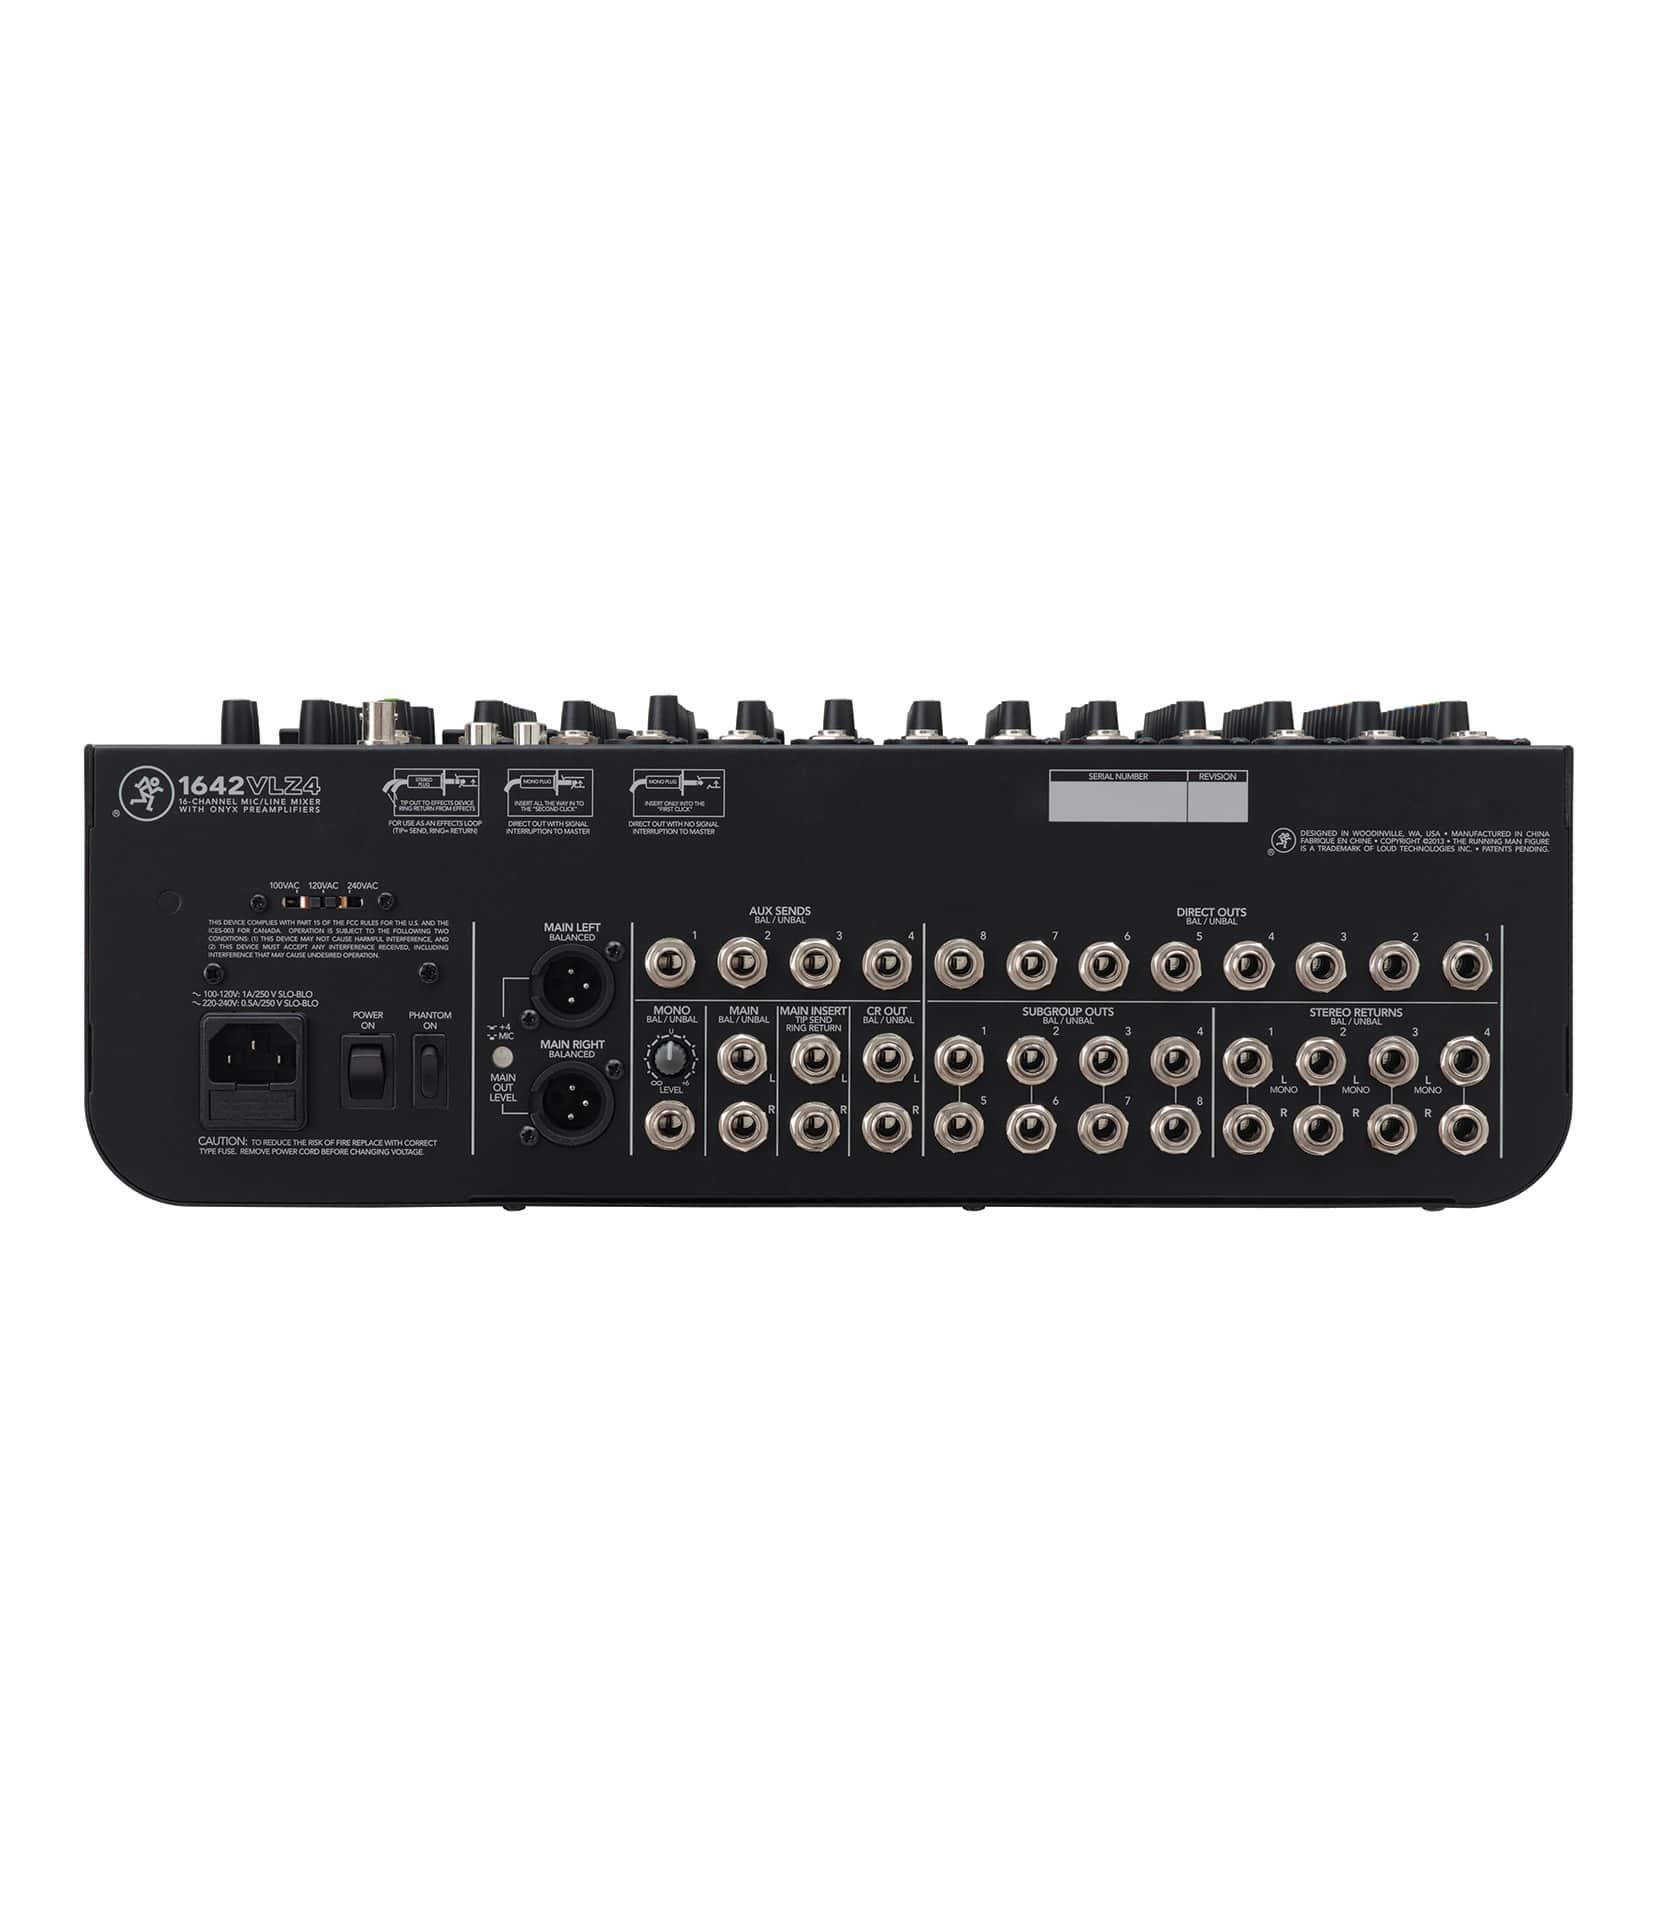 1642VLZ4 16 Channel Compact 4 bus Mixer - Buy Online